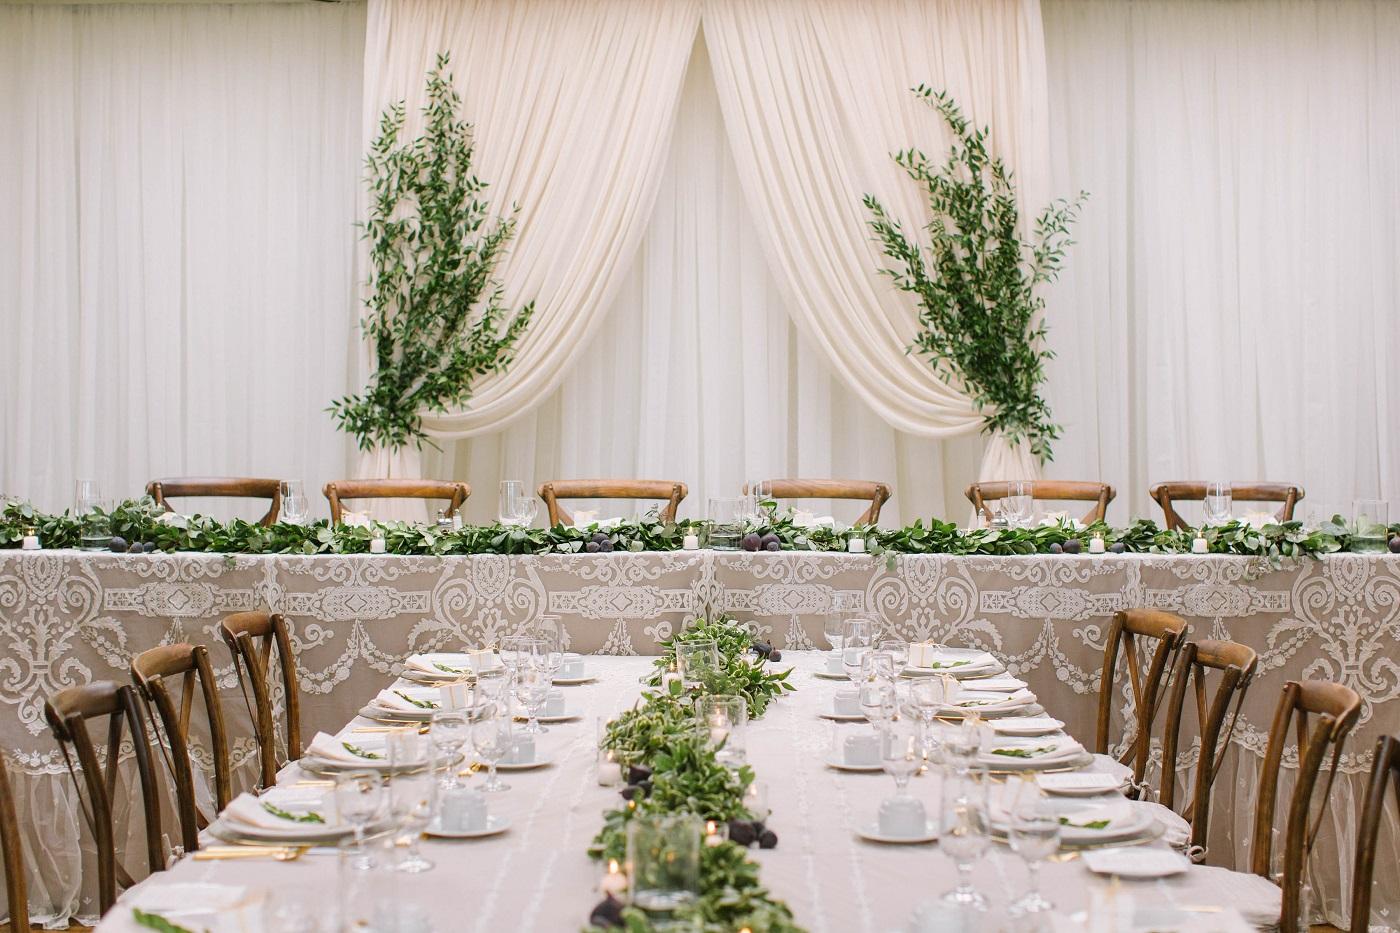 liuna-gardens-wedding-hamilton-kj-and-co-21.JPG